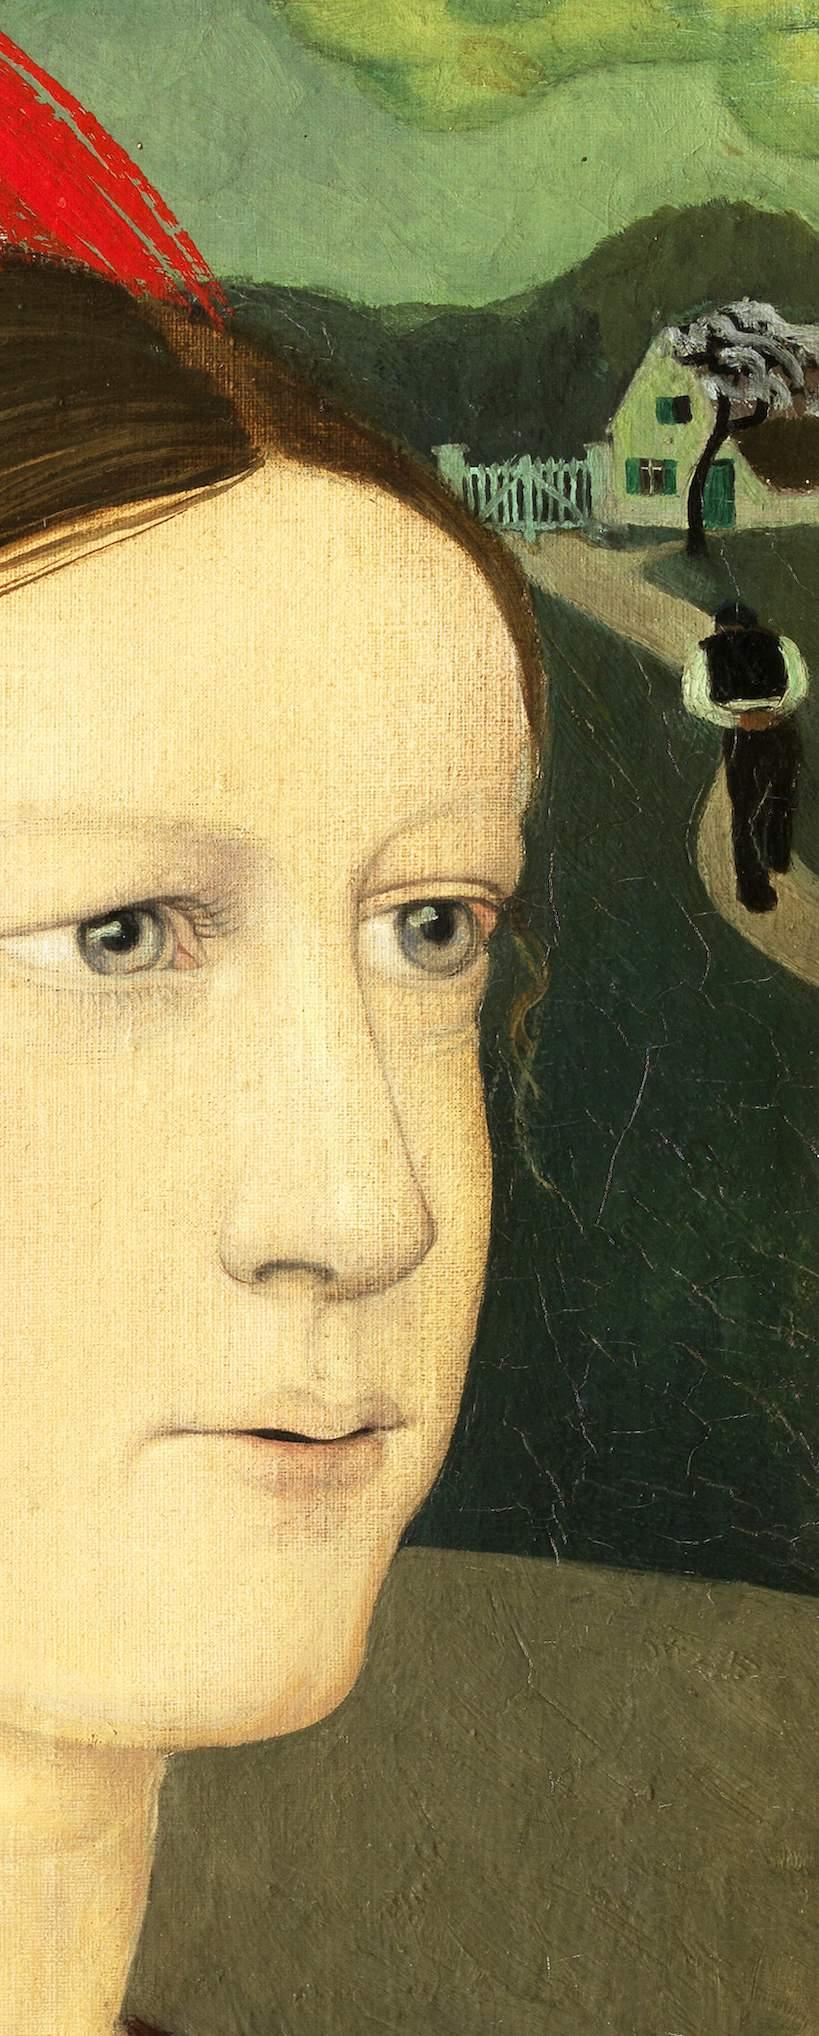 4 Gustave van de Woestyne, détail